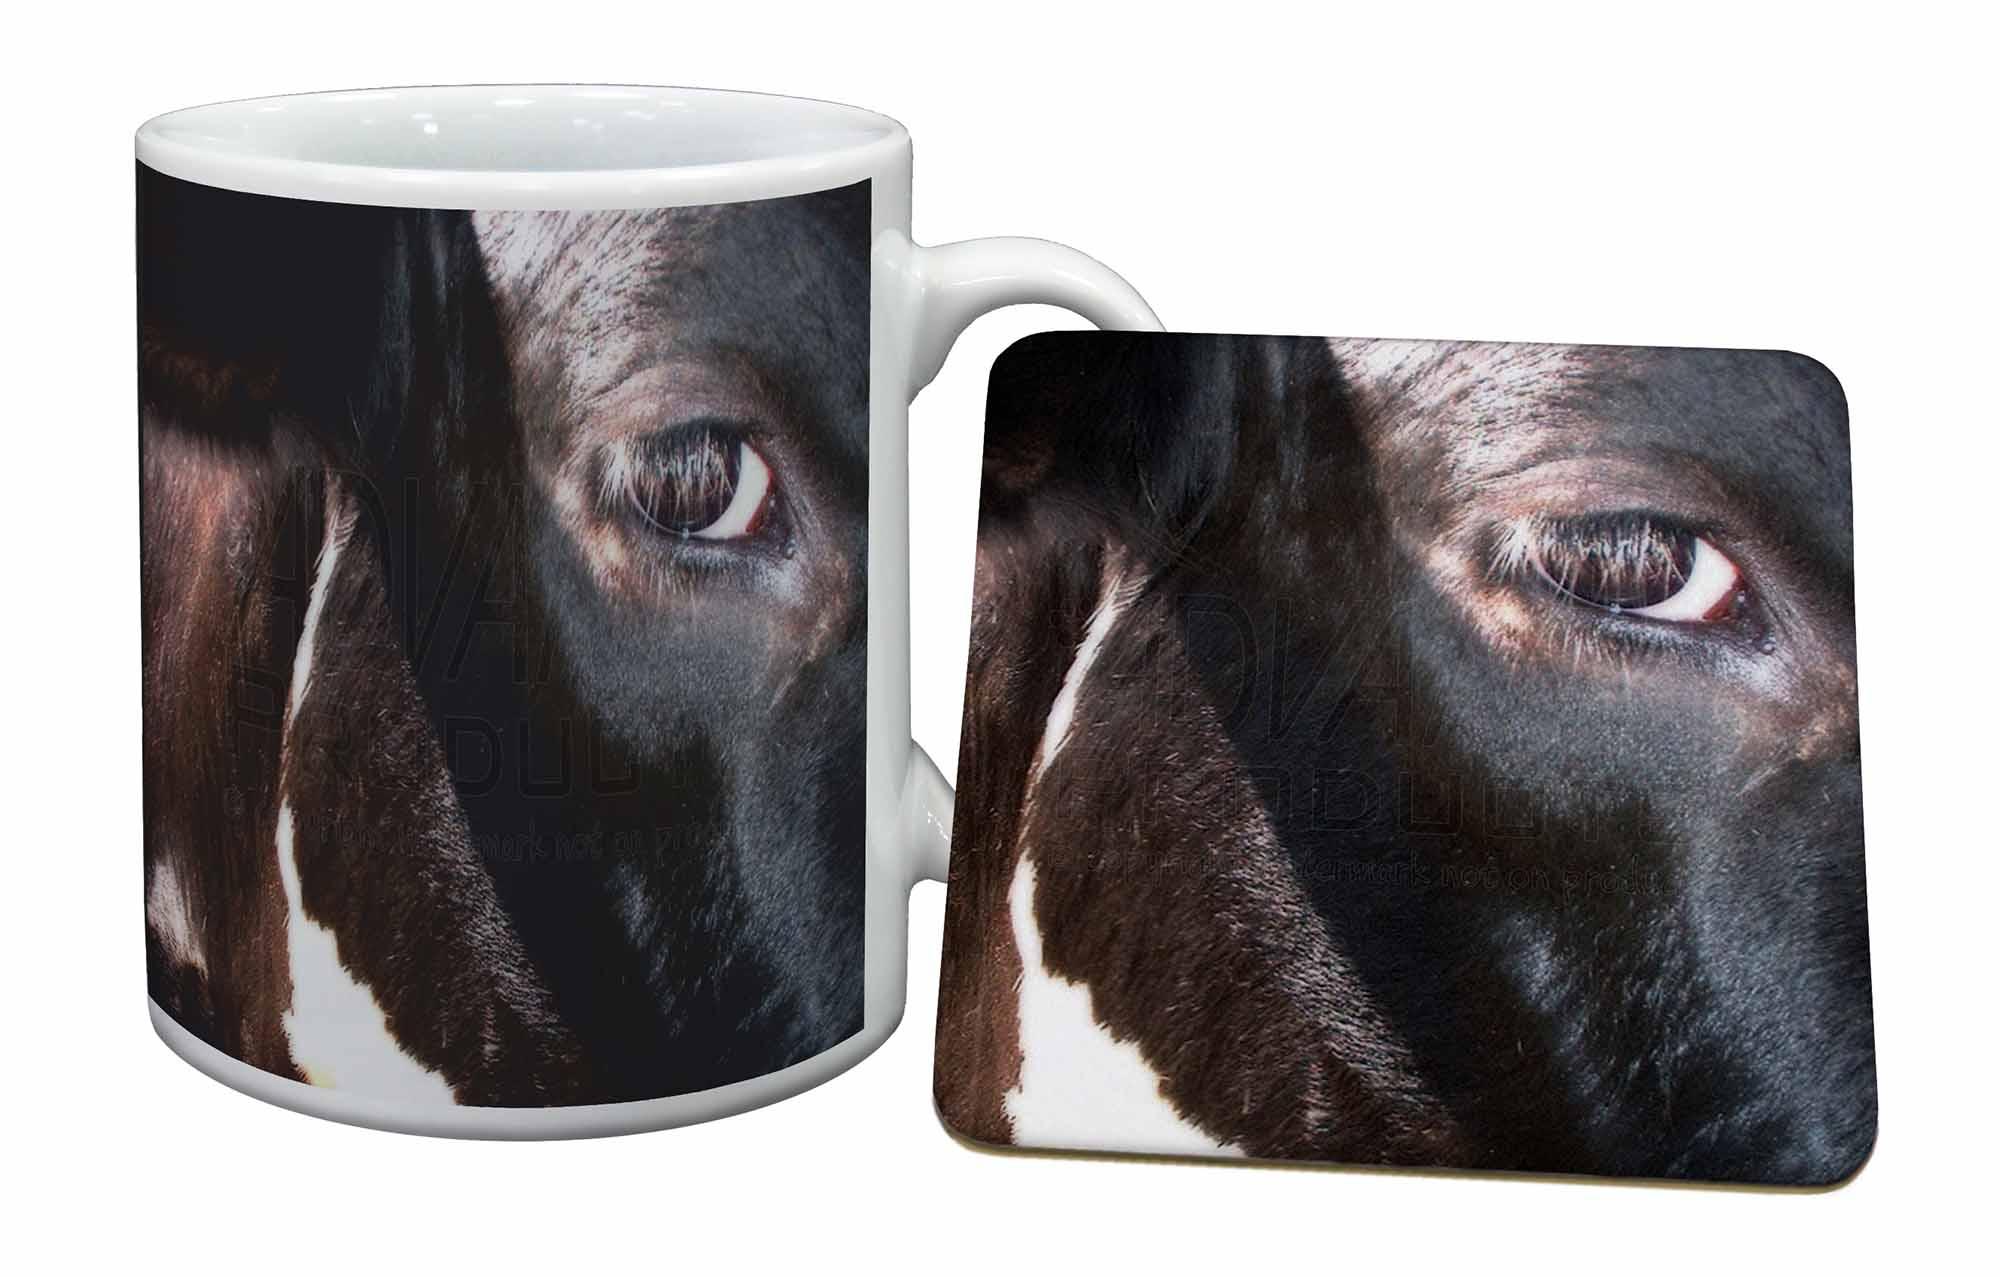 Pretty fresian cow face mug and coaster animal gifts ebay for Animal face mugs